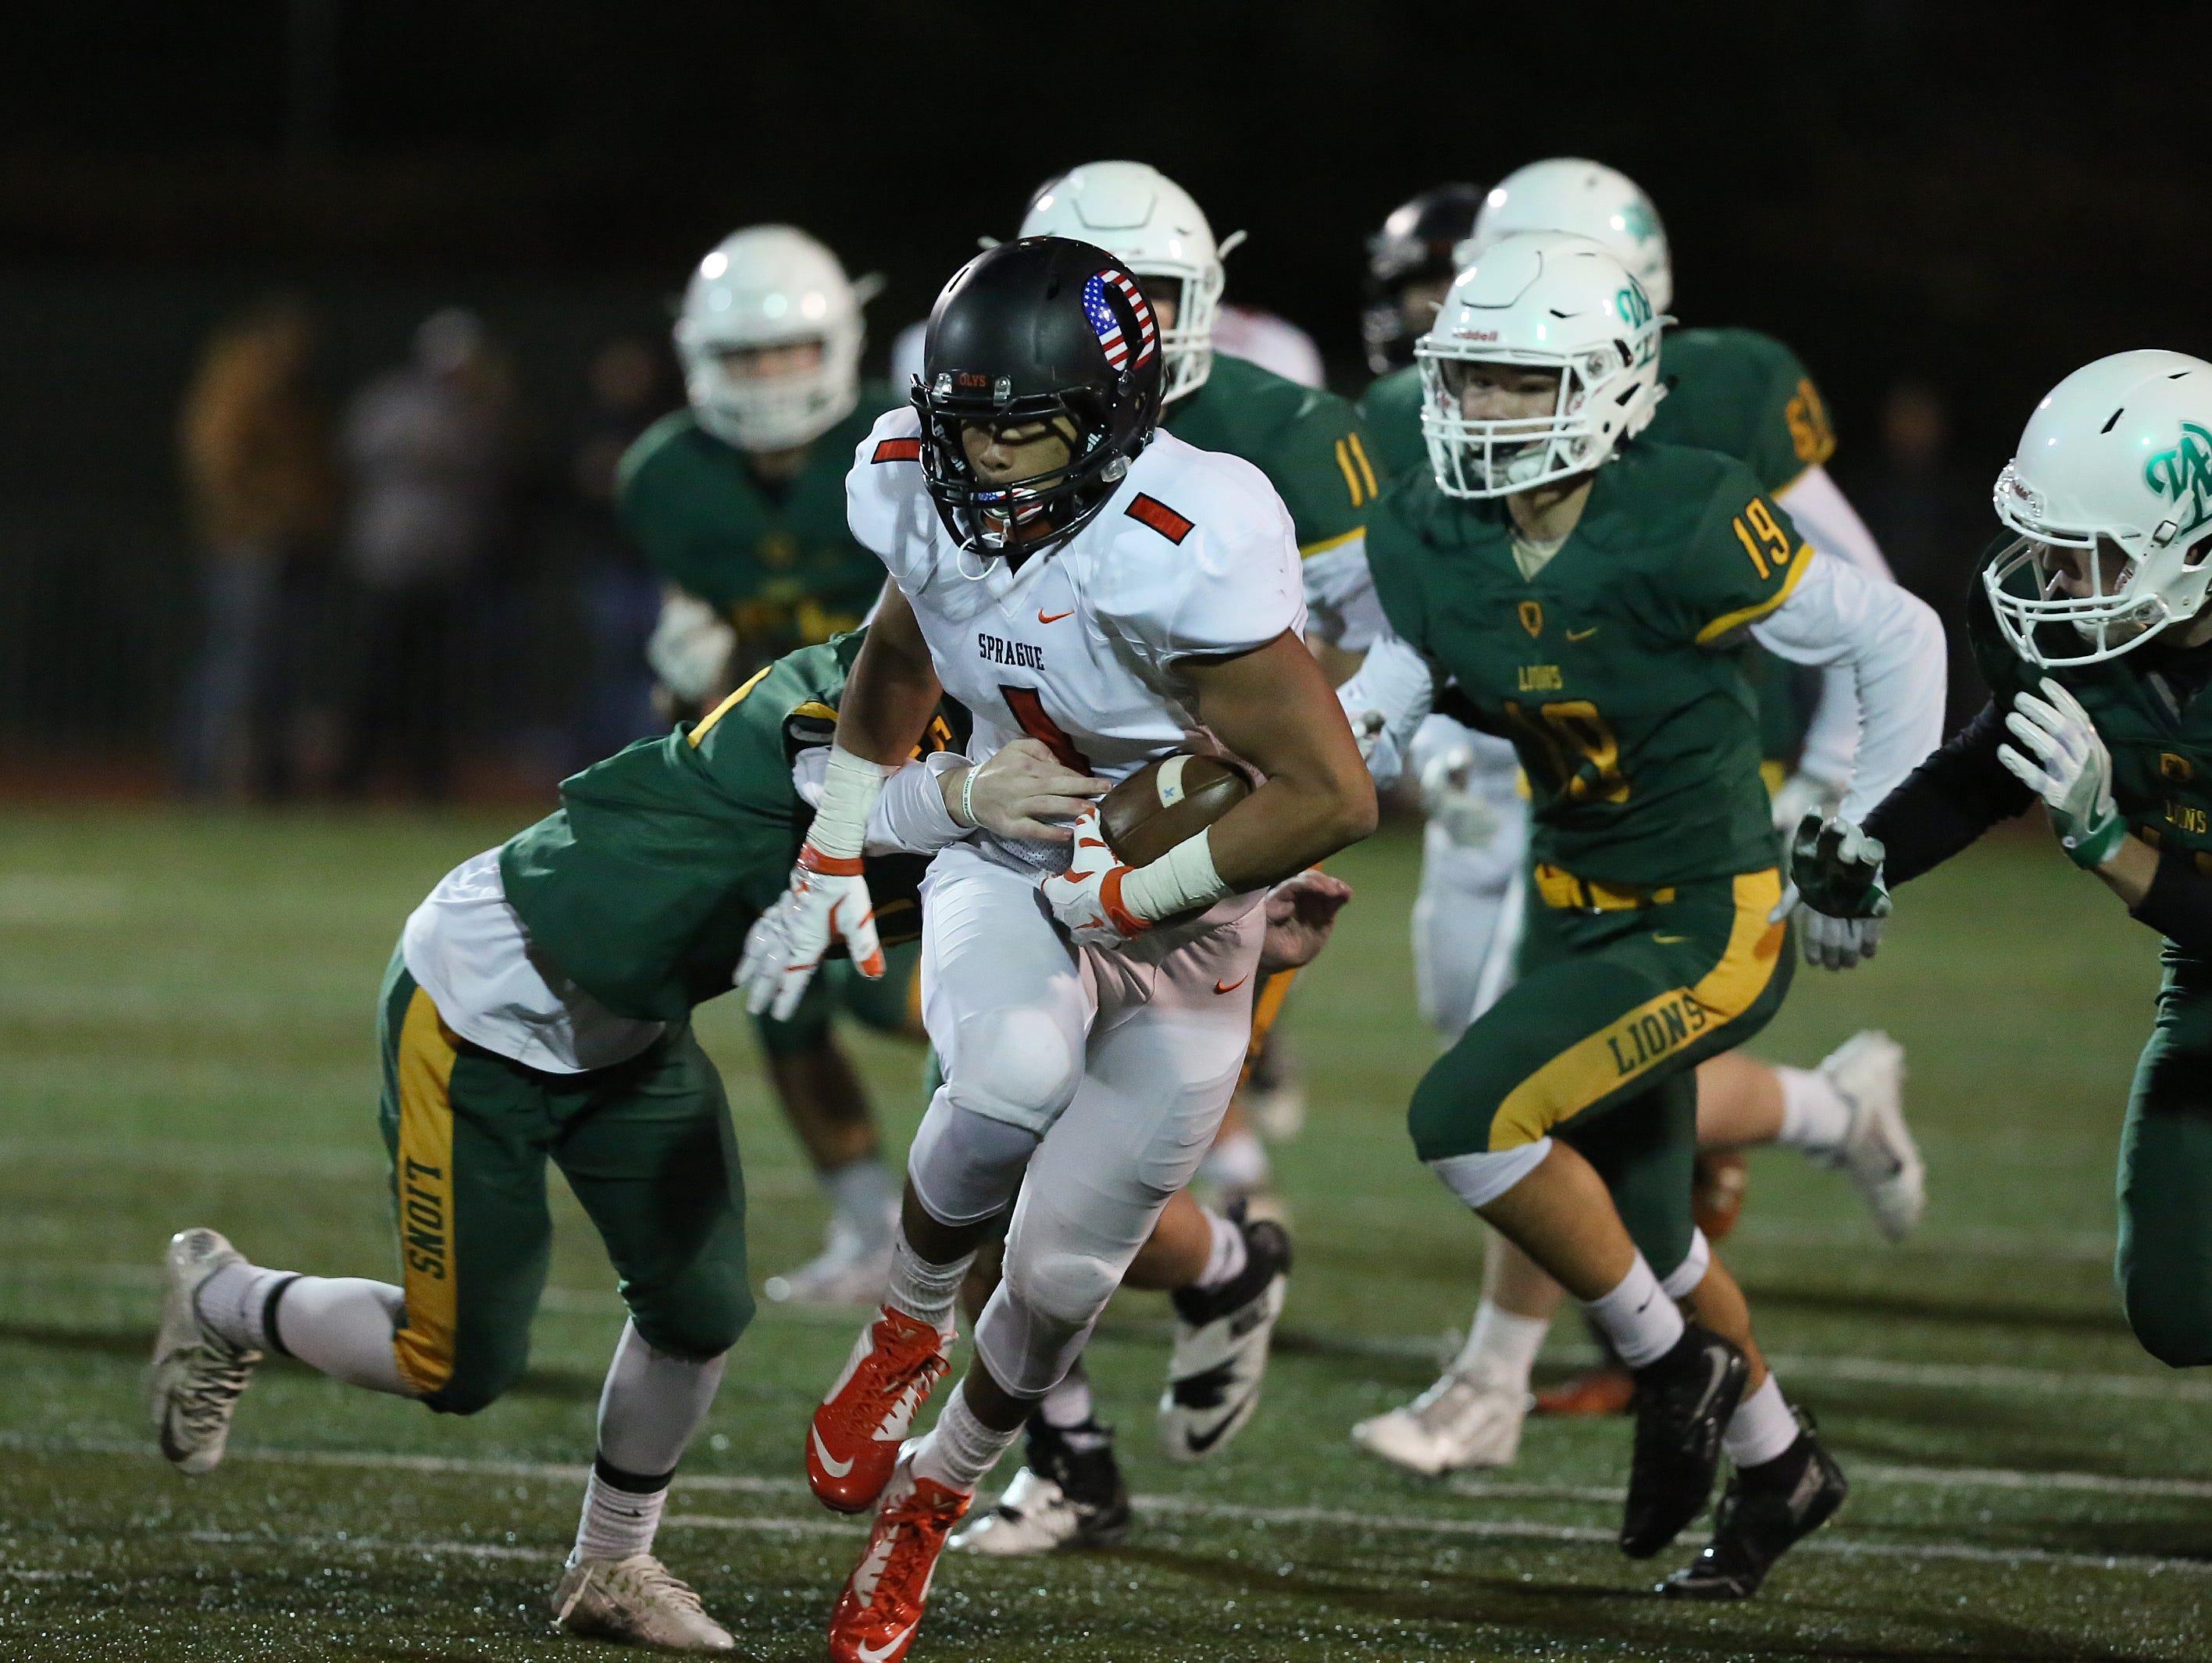 West Linn defenders try to take down Sprague's Noah Mellen in the OSAA Class 6A state quarterfinals on Friday, Nov. 18, 2016, at West Linn High School. West Linn defeated Sprague 56-20.